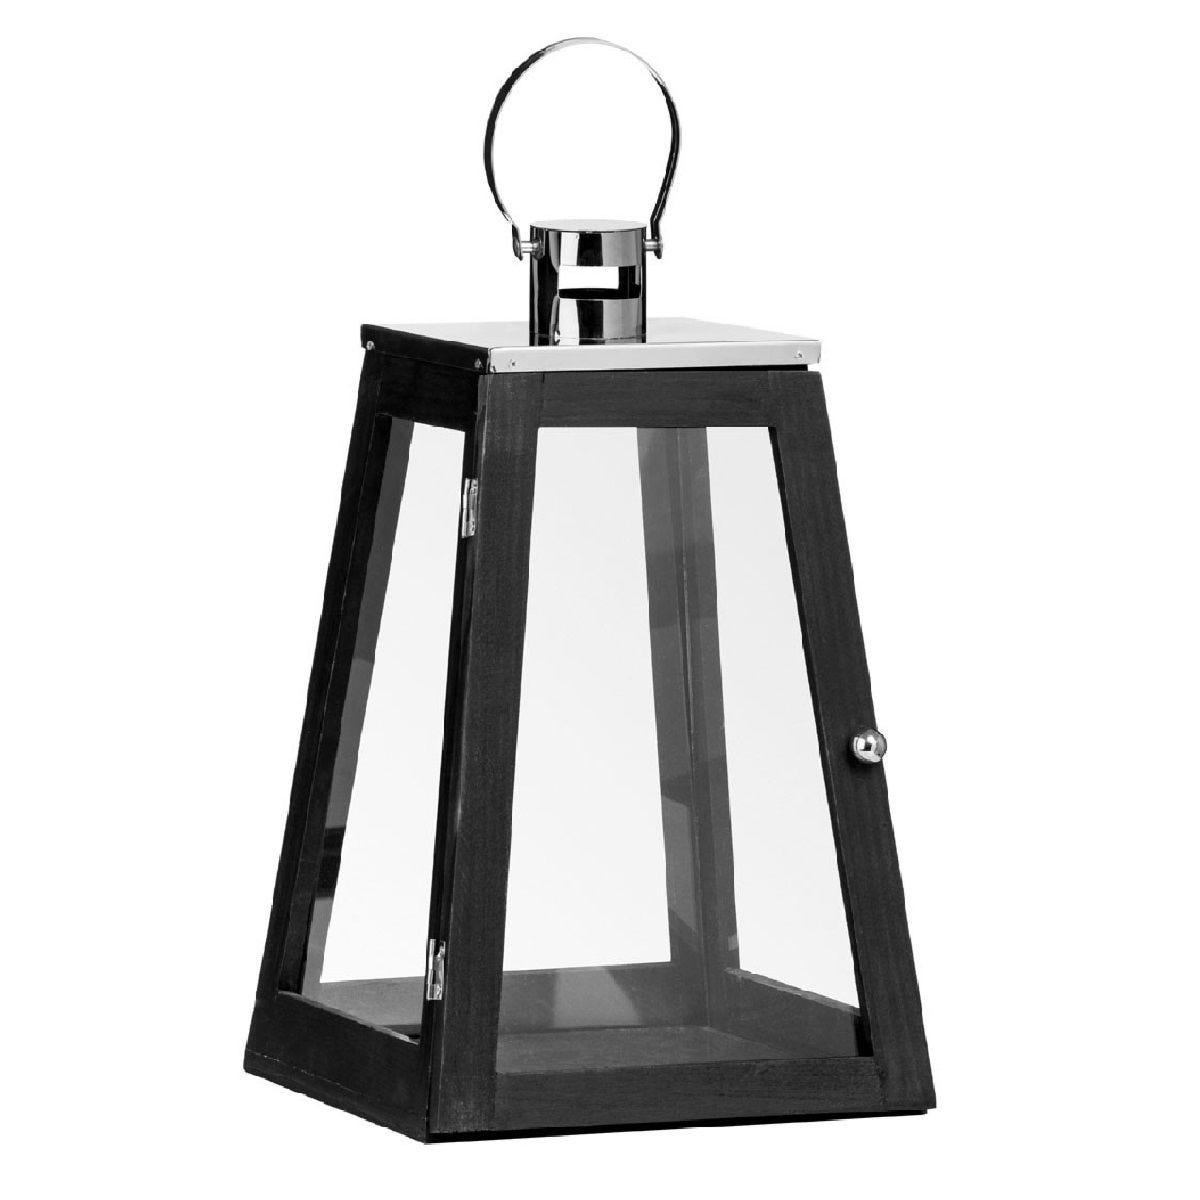 Premier Housewares Regents Park Pyramid Lantern - Black Wood/Metal